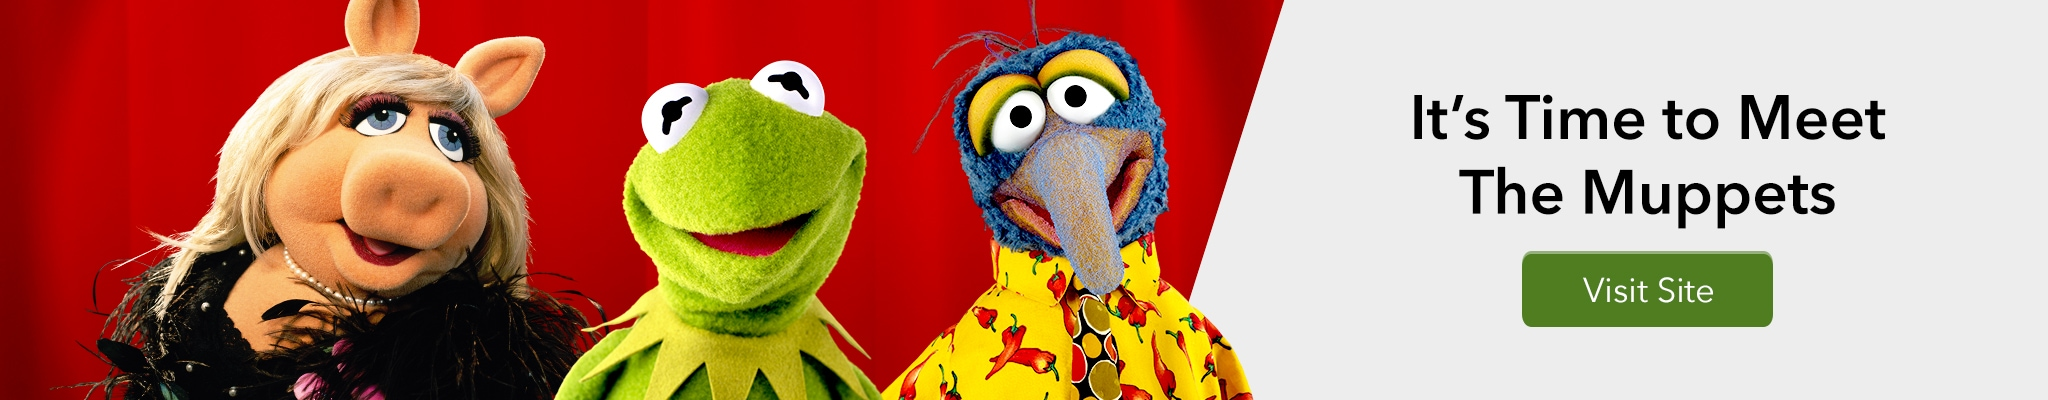 The Muppet Christmas Carol Disney Movies